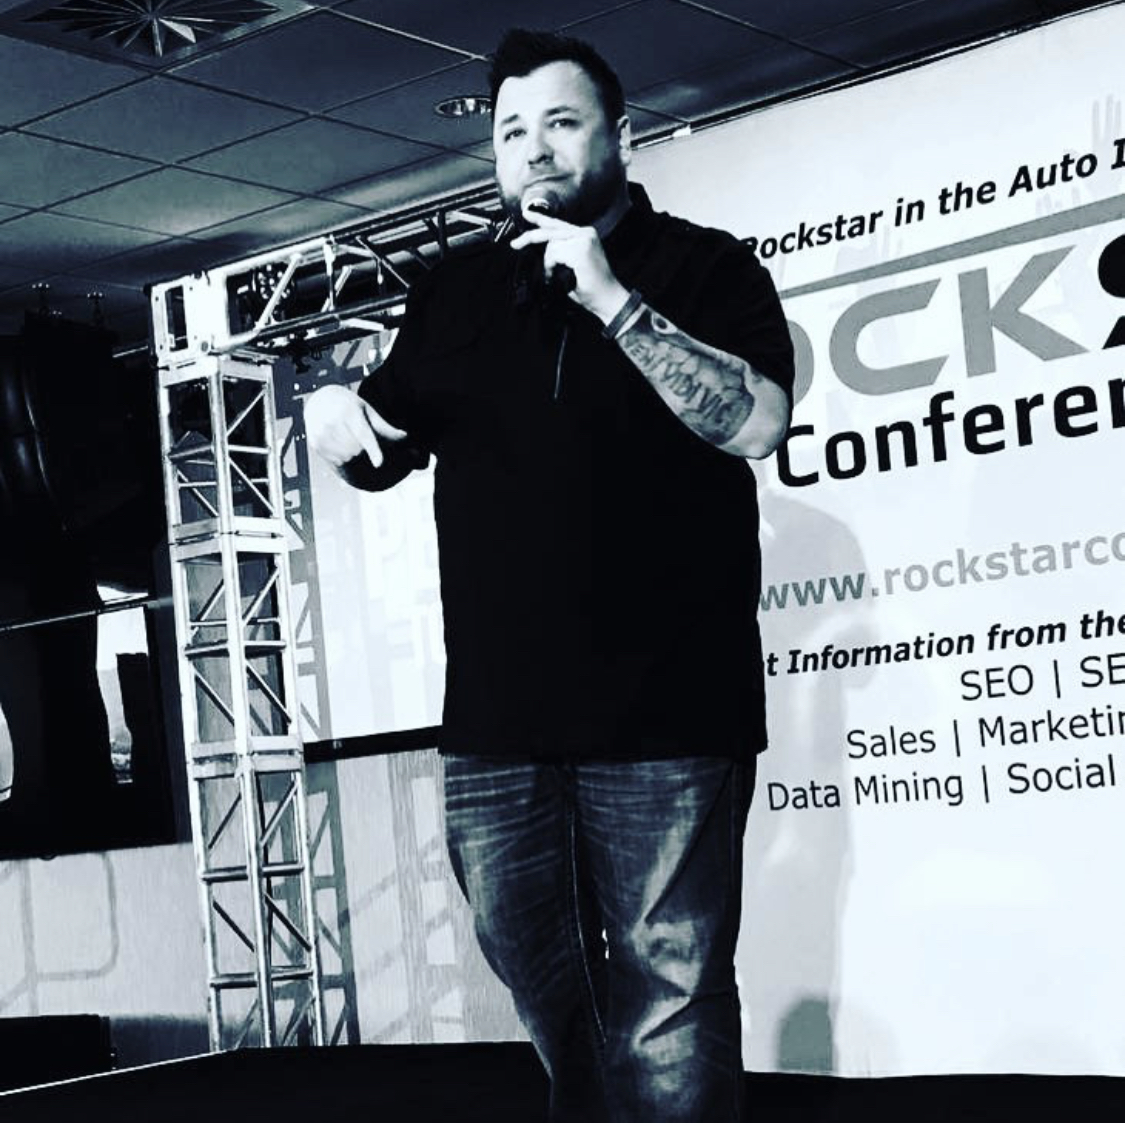 Mat speaking on the Rockstar Stage